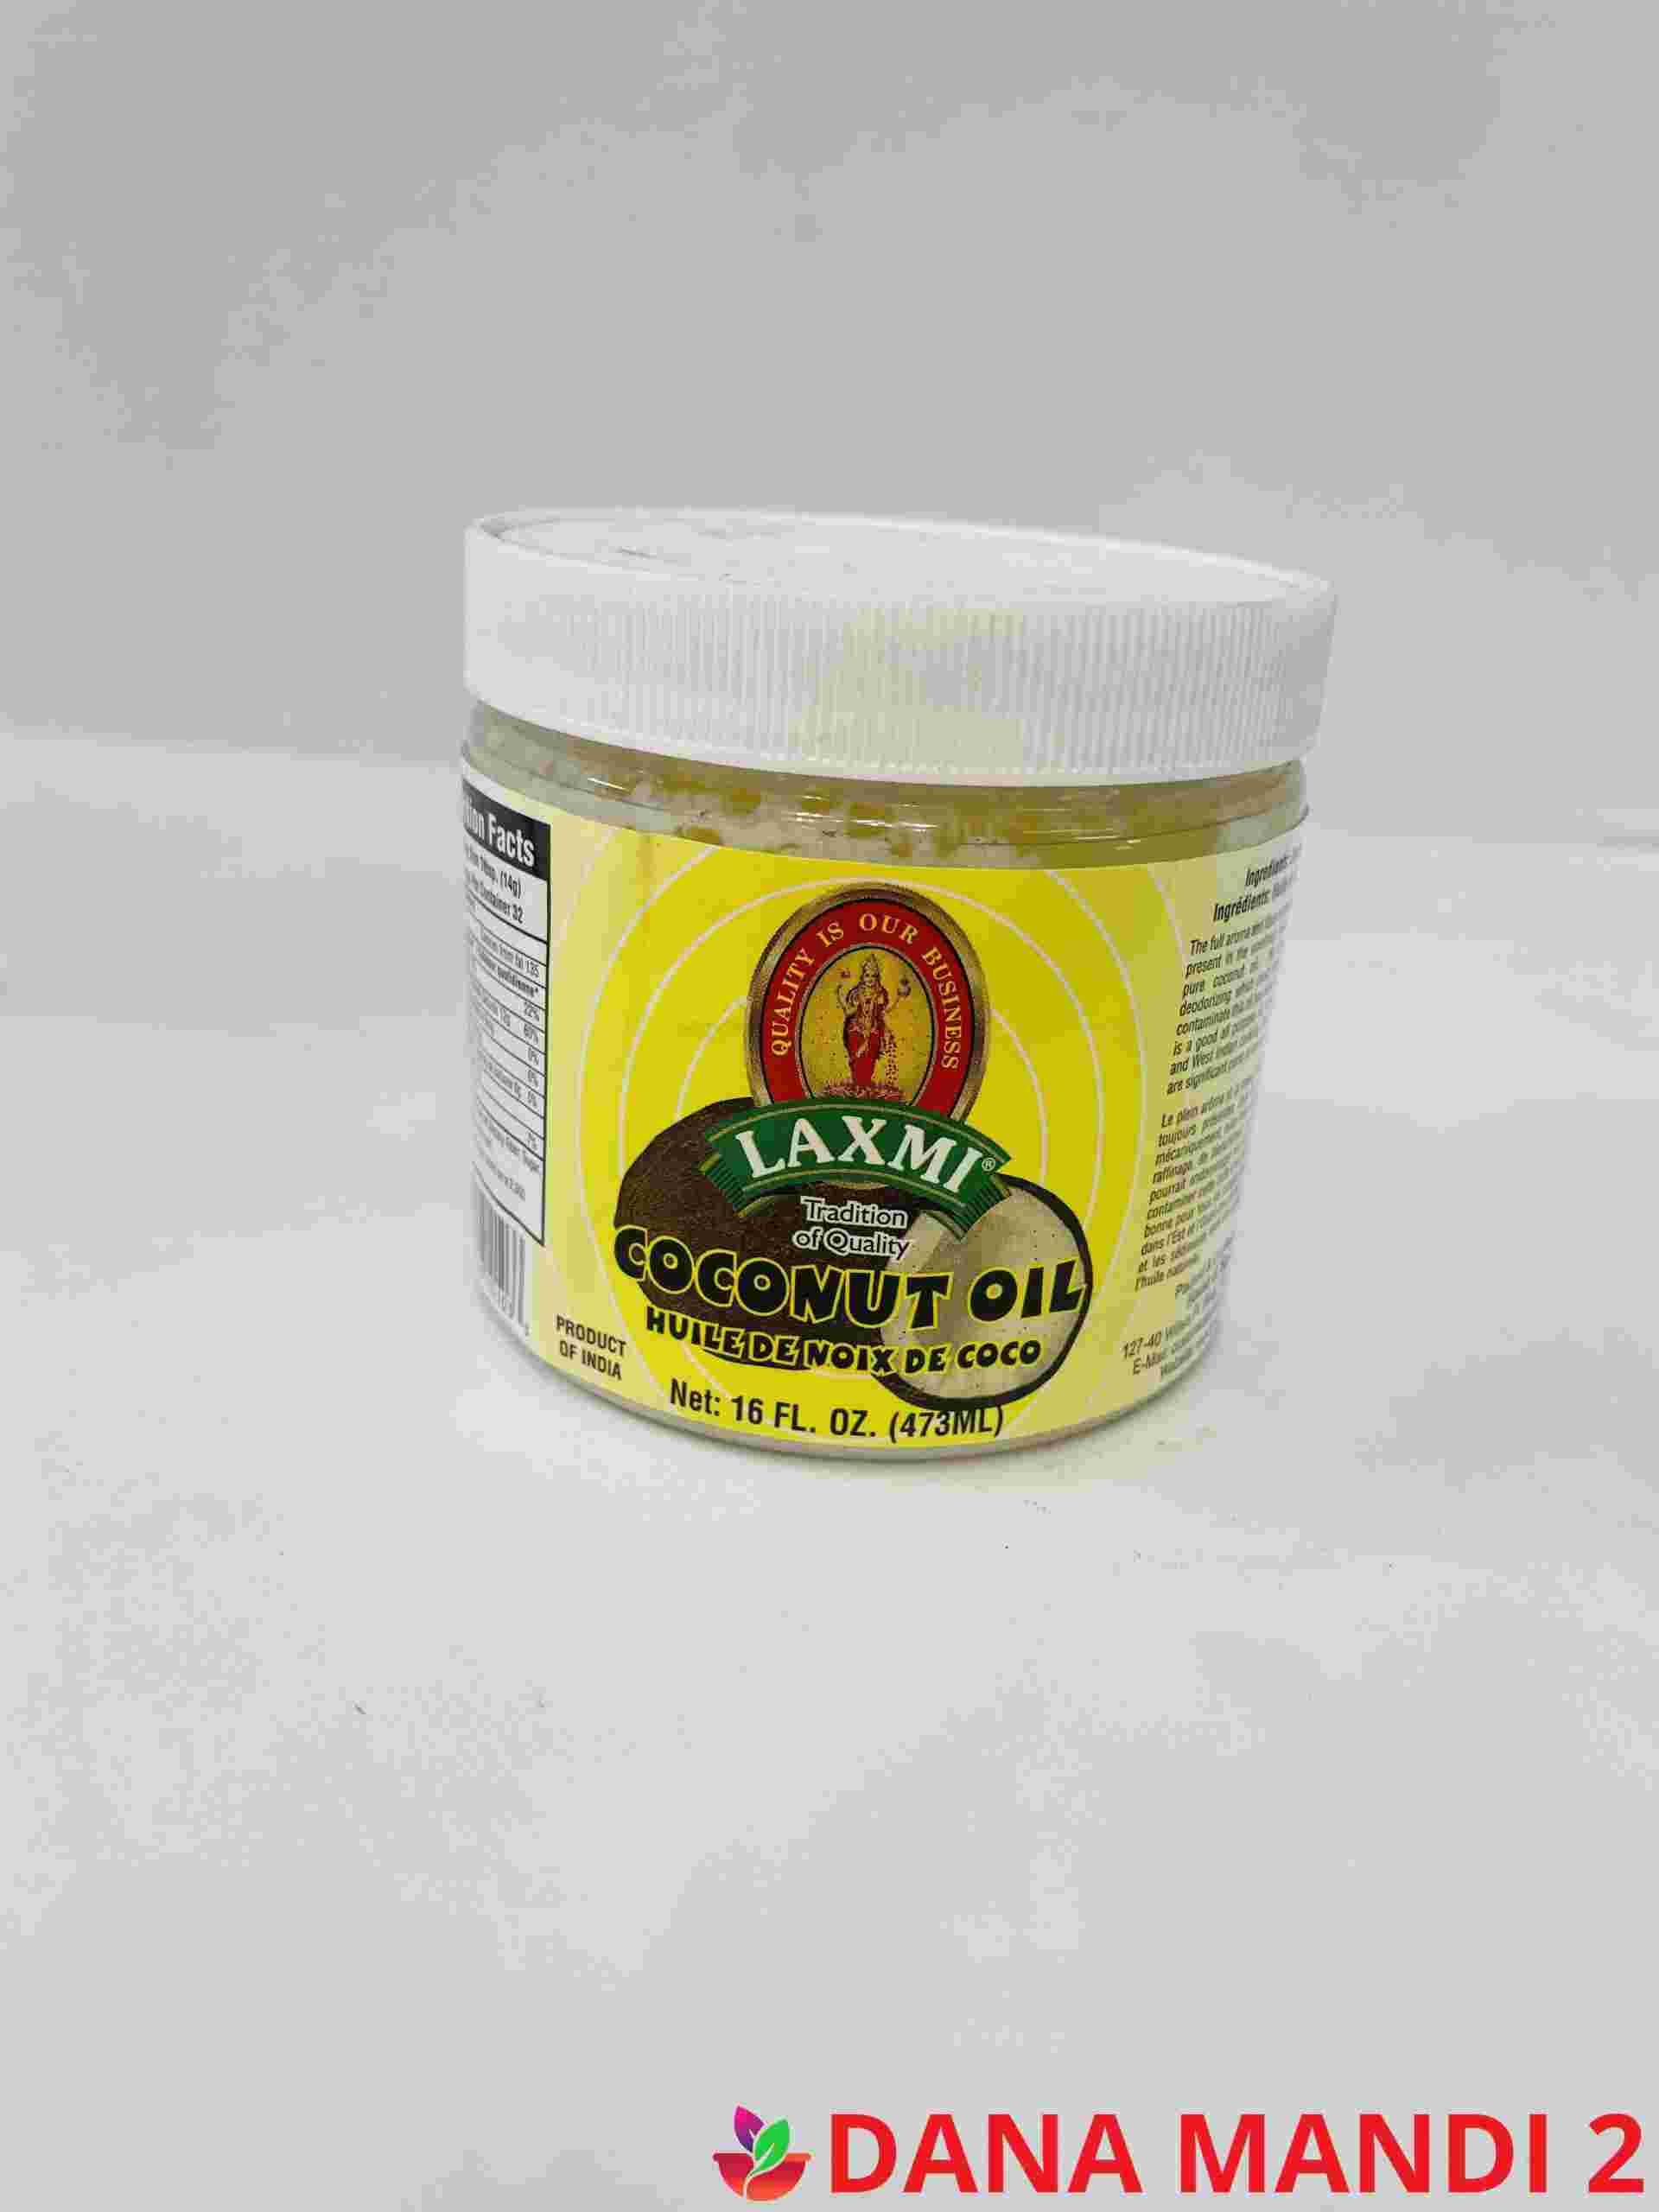 Laxmi Ghee Coconut Oil